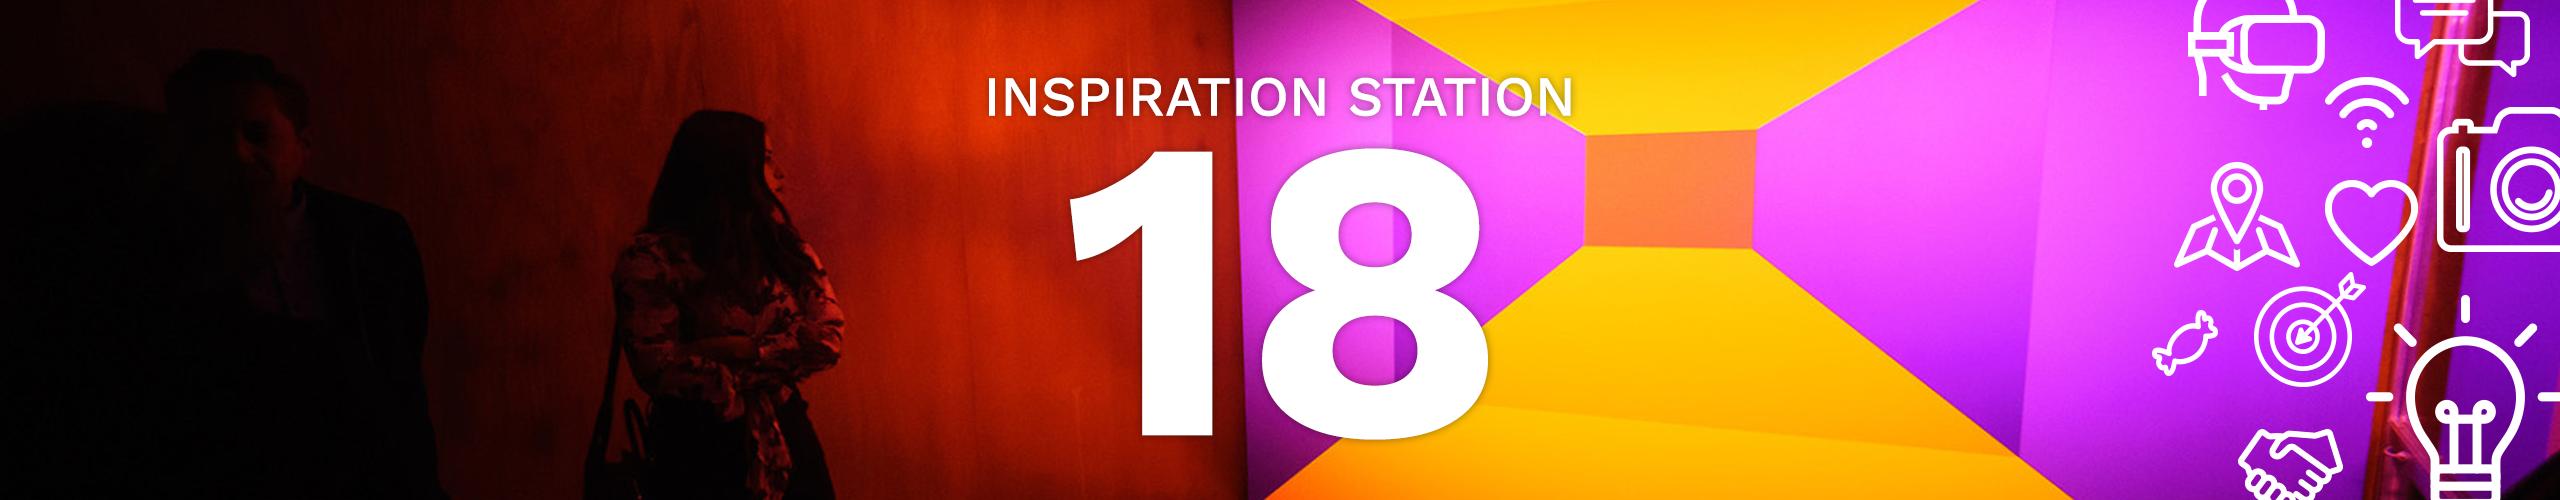 Inspiration Station Vol. 18